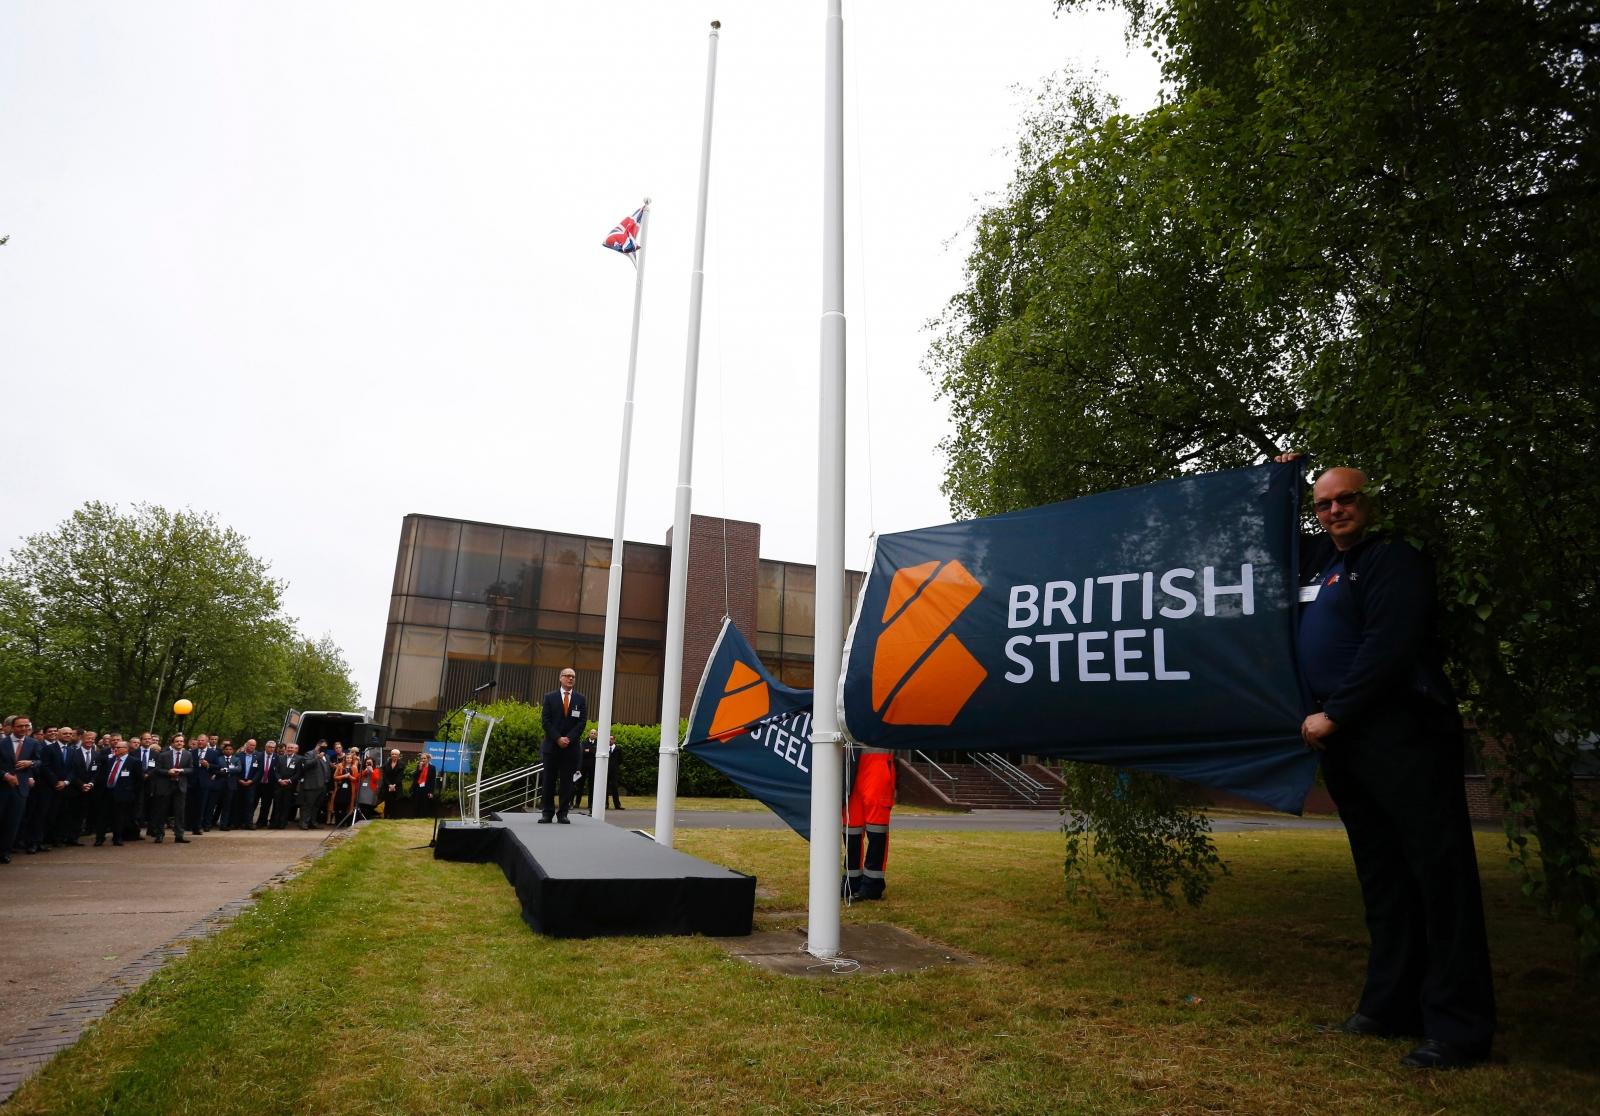 british steel - photo #15